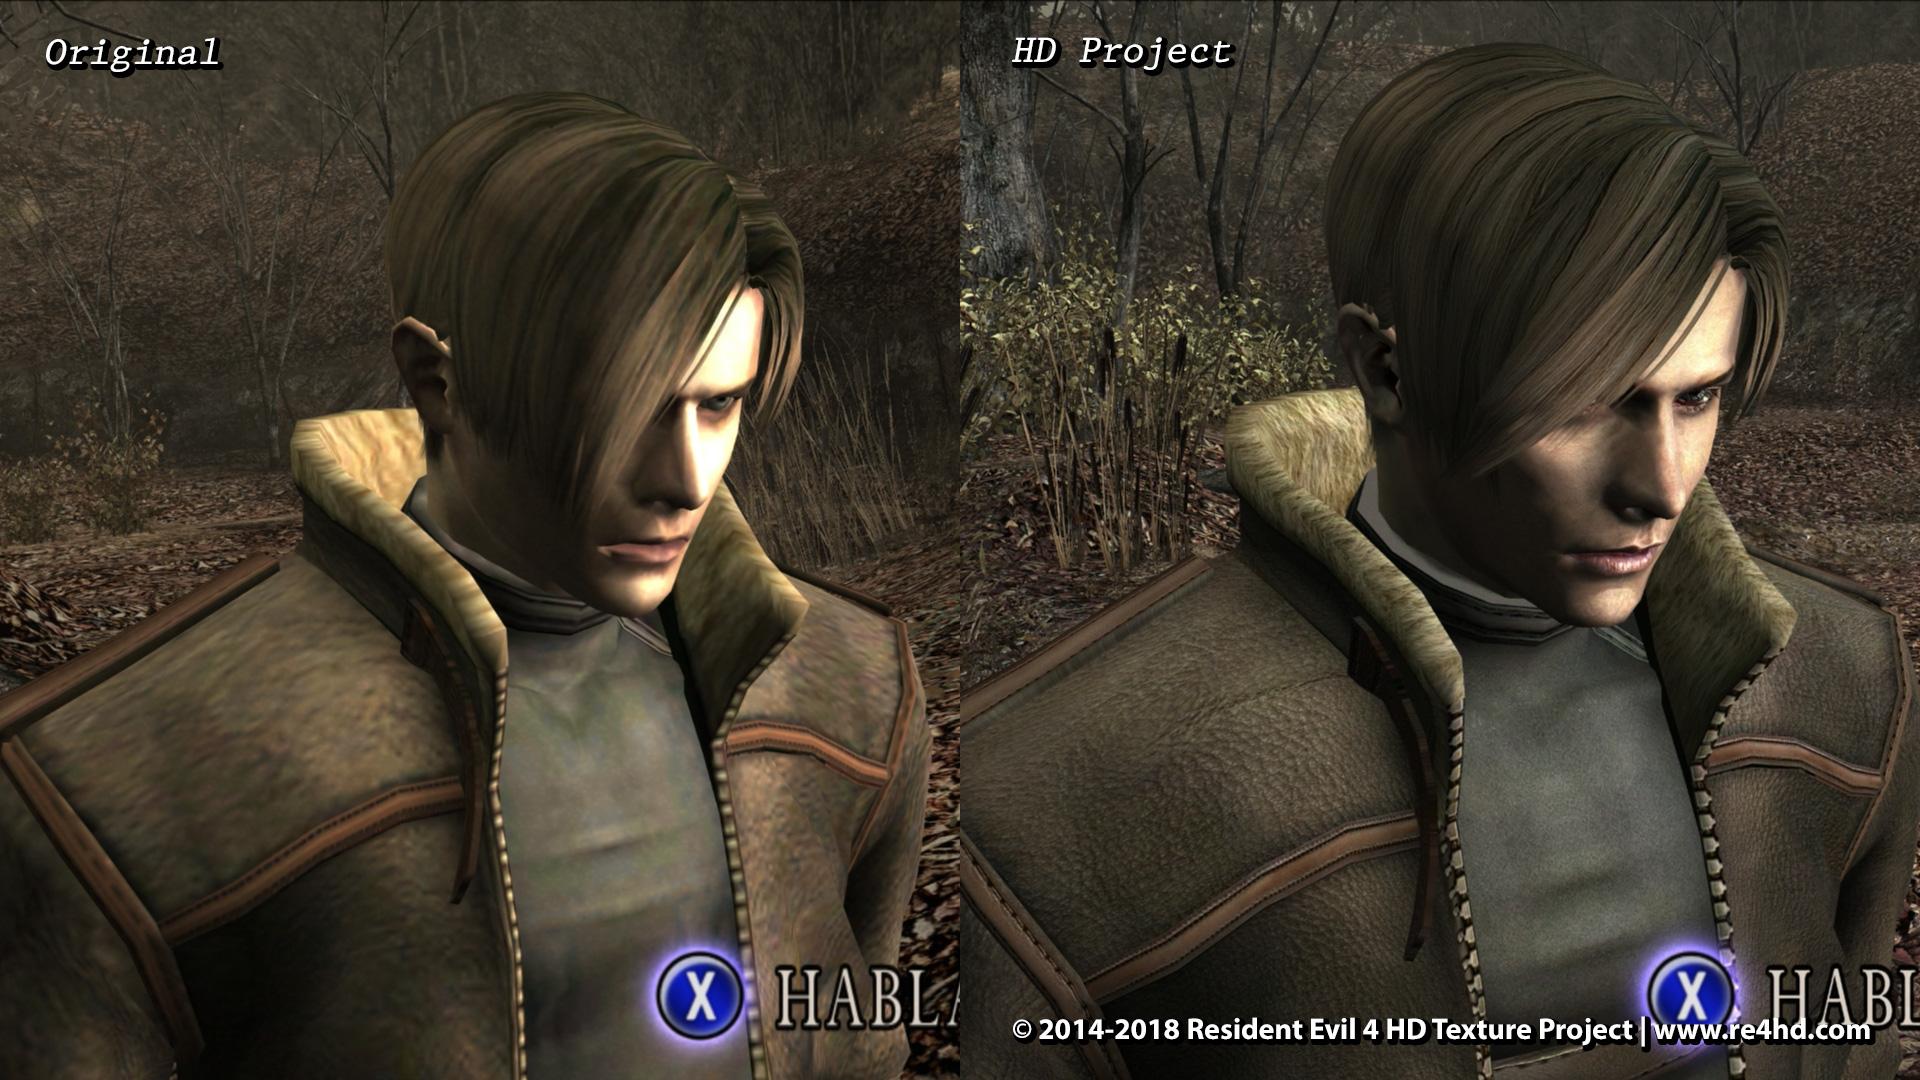 Resident Evil 4 Hd Project New Screenshots Showcase Character Models Improvements